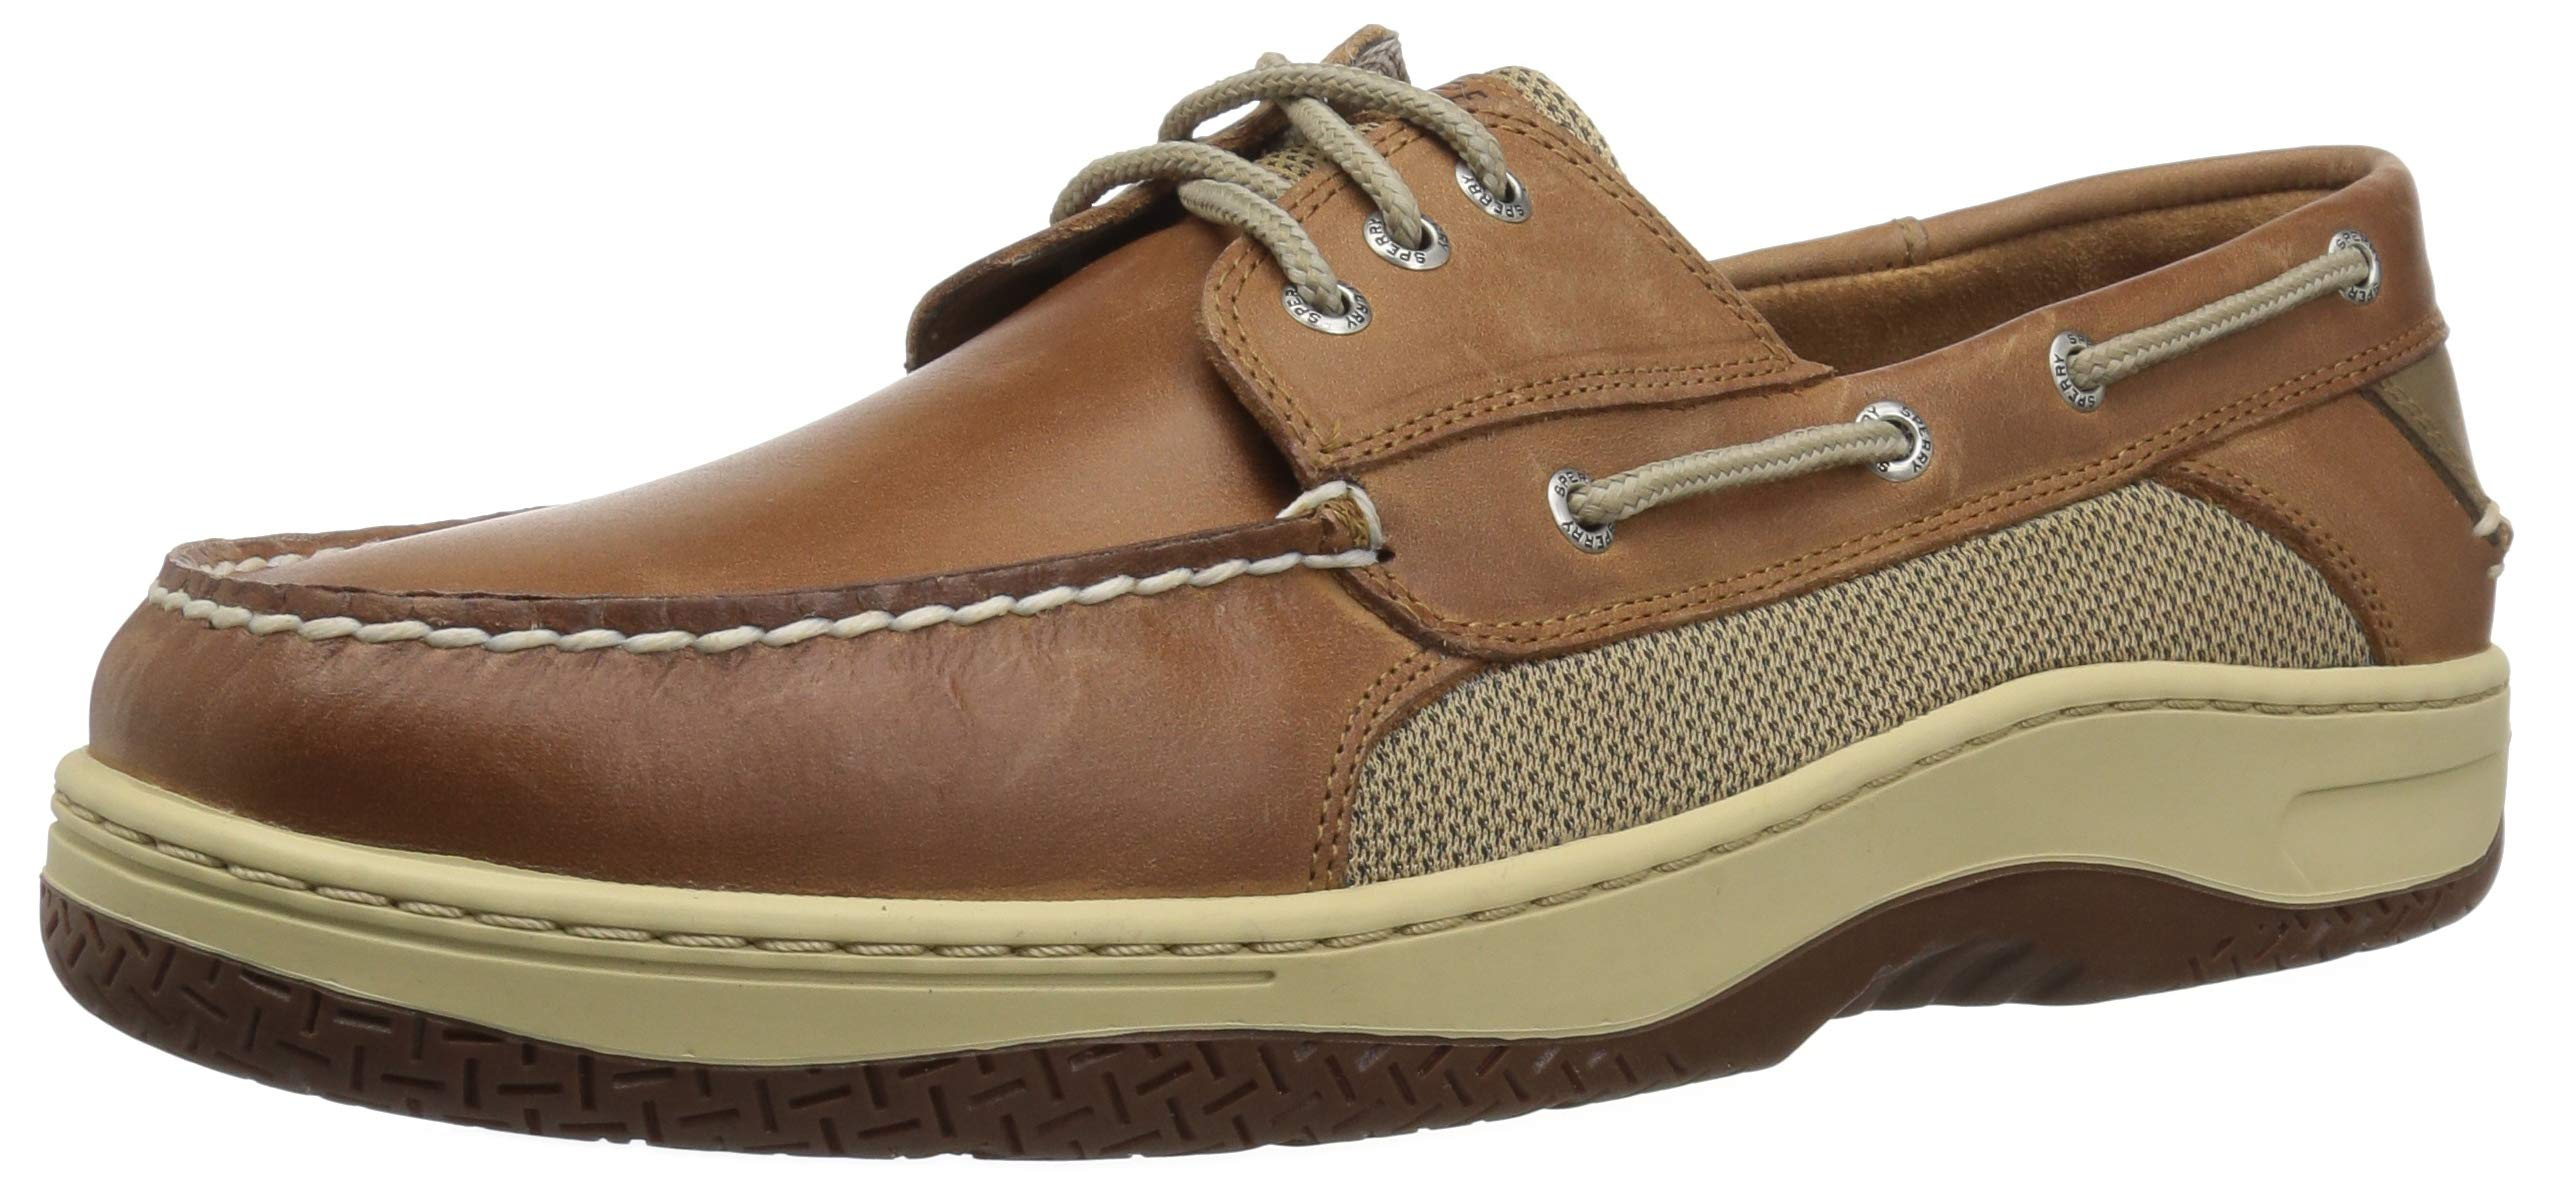 Sperry Men's Billfish 3-Eye Boat Shoe Dark tan 13 XW US